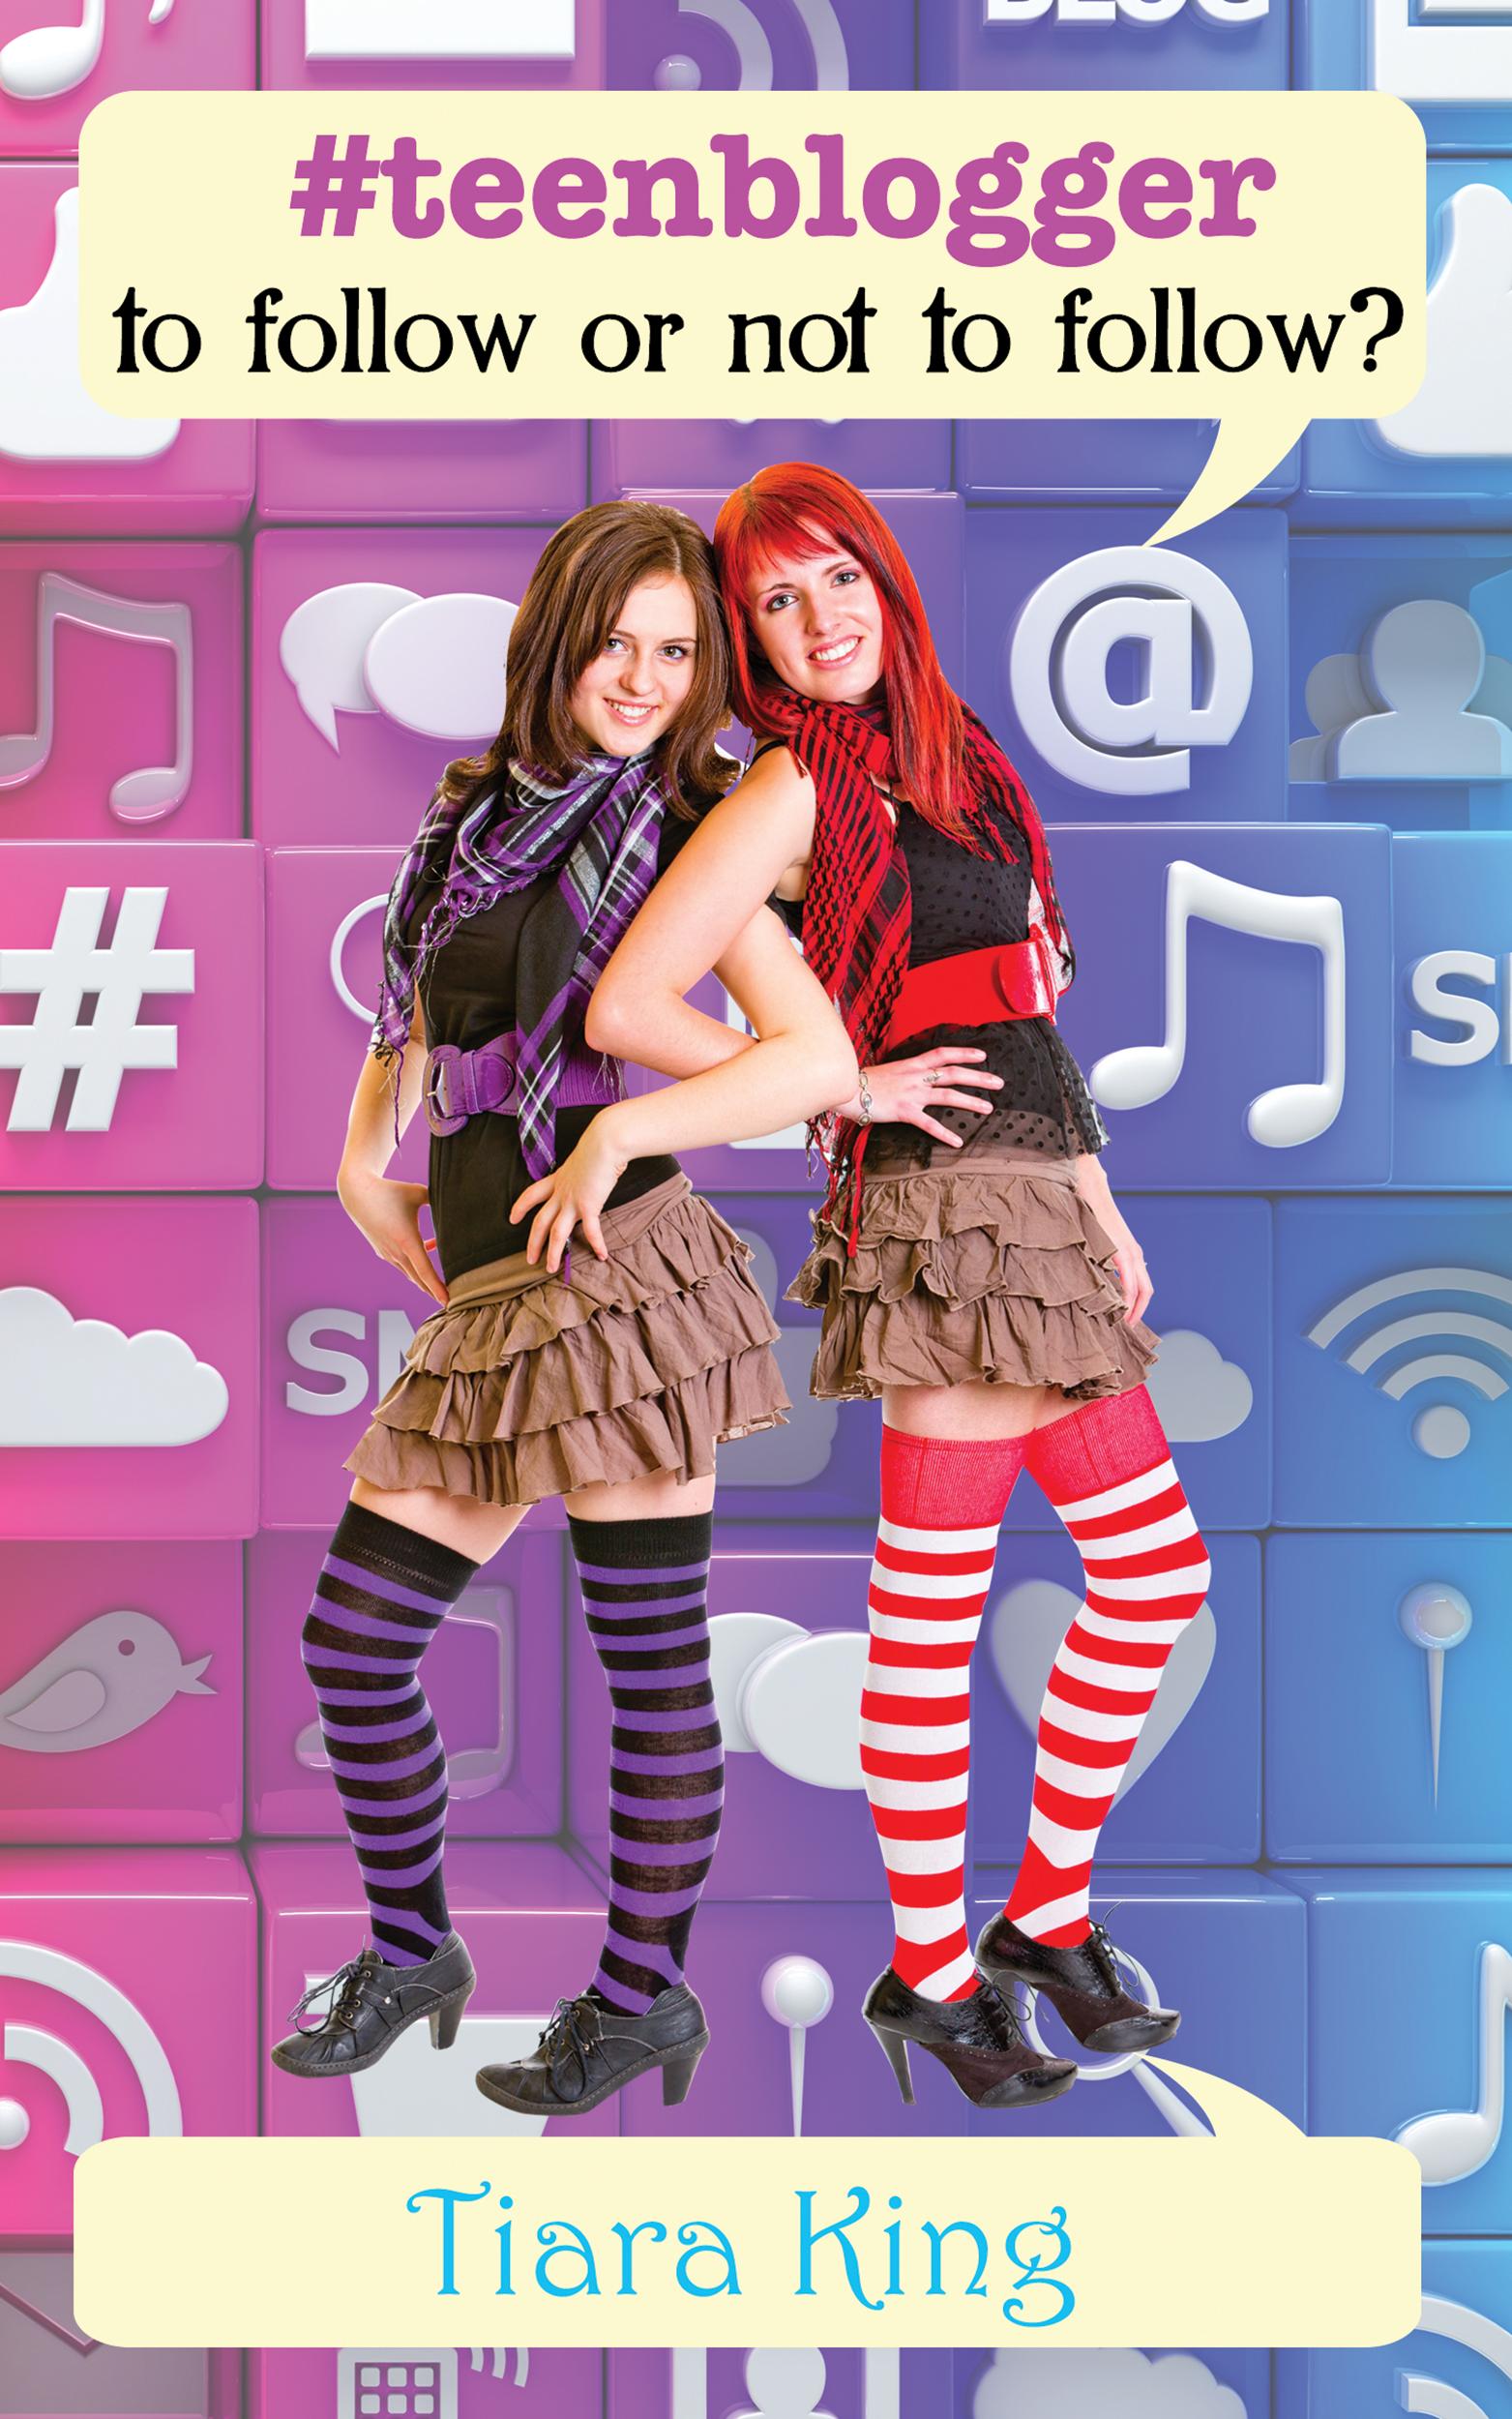 Tiara King's #teenblogger: To Follow Or Not To Follow?